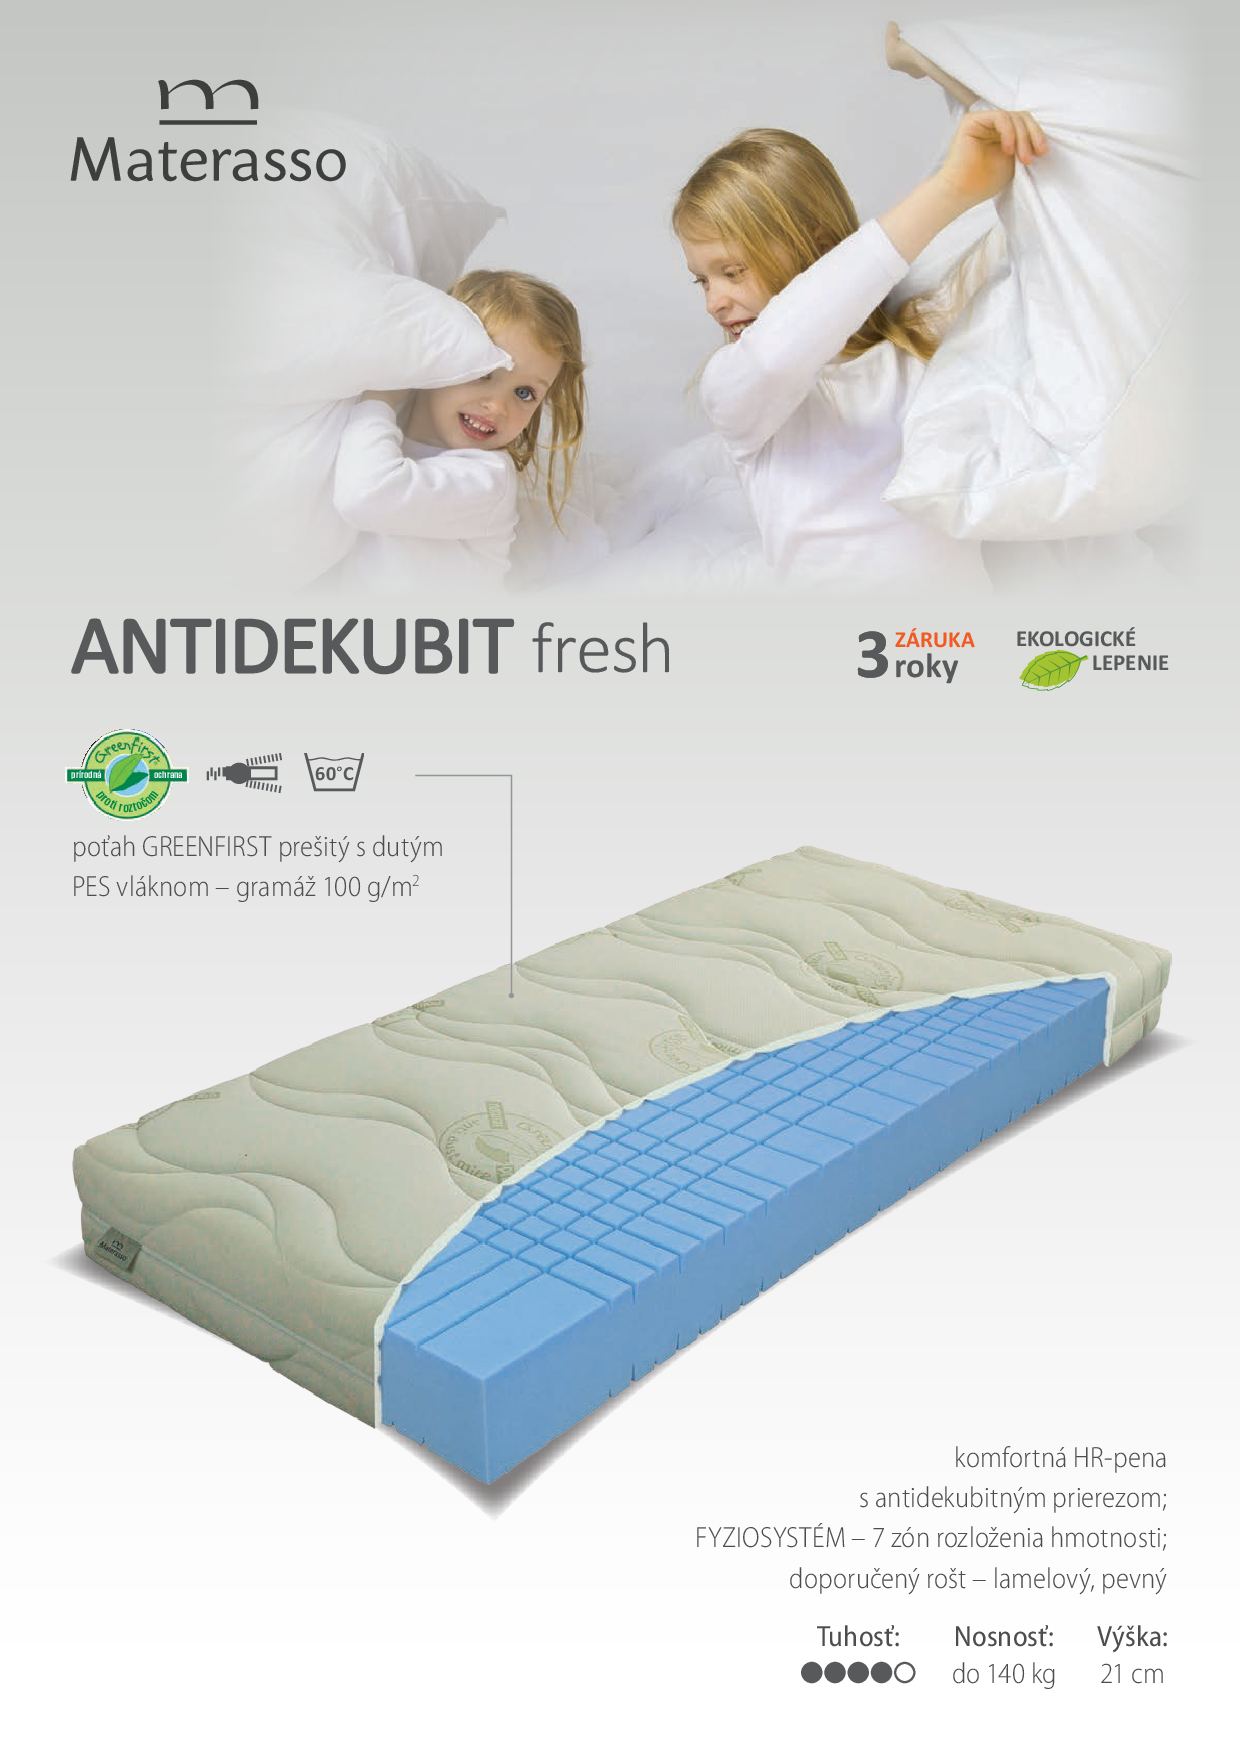 Antidecubit fresch